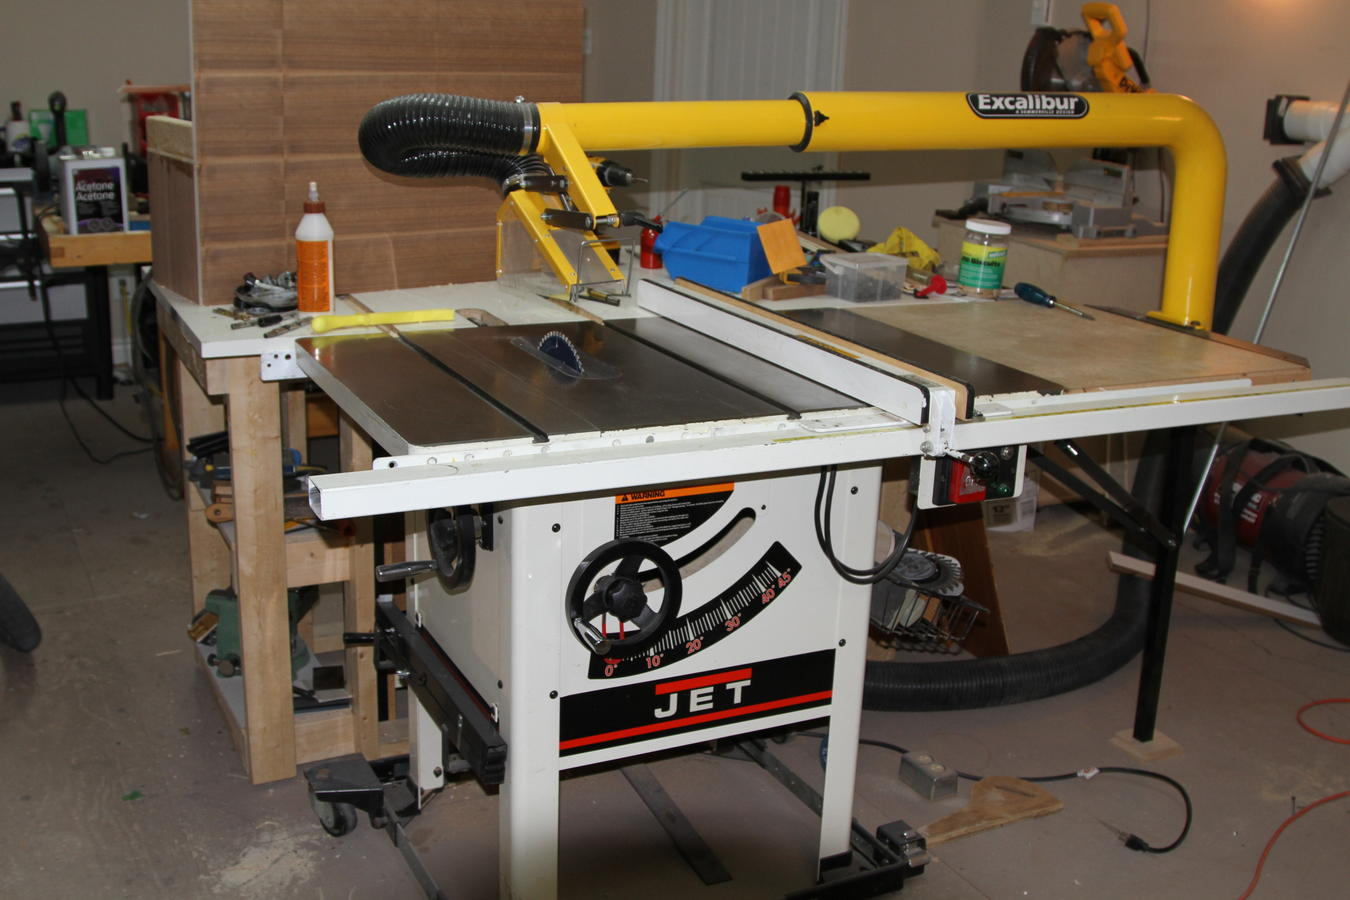 For Sale Jet Jwss 10lfr Hybrid Table Saw W Sliding Table